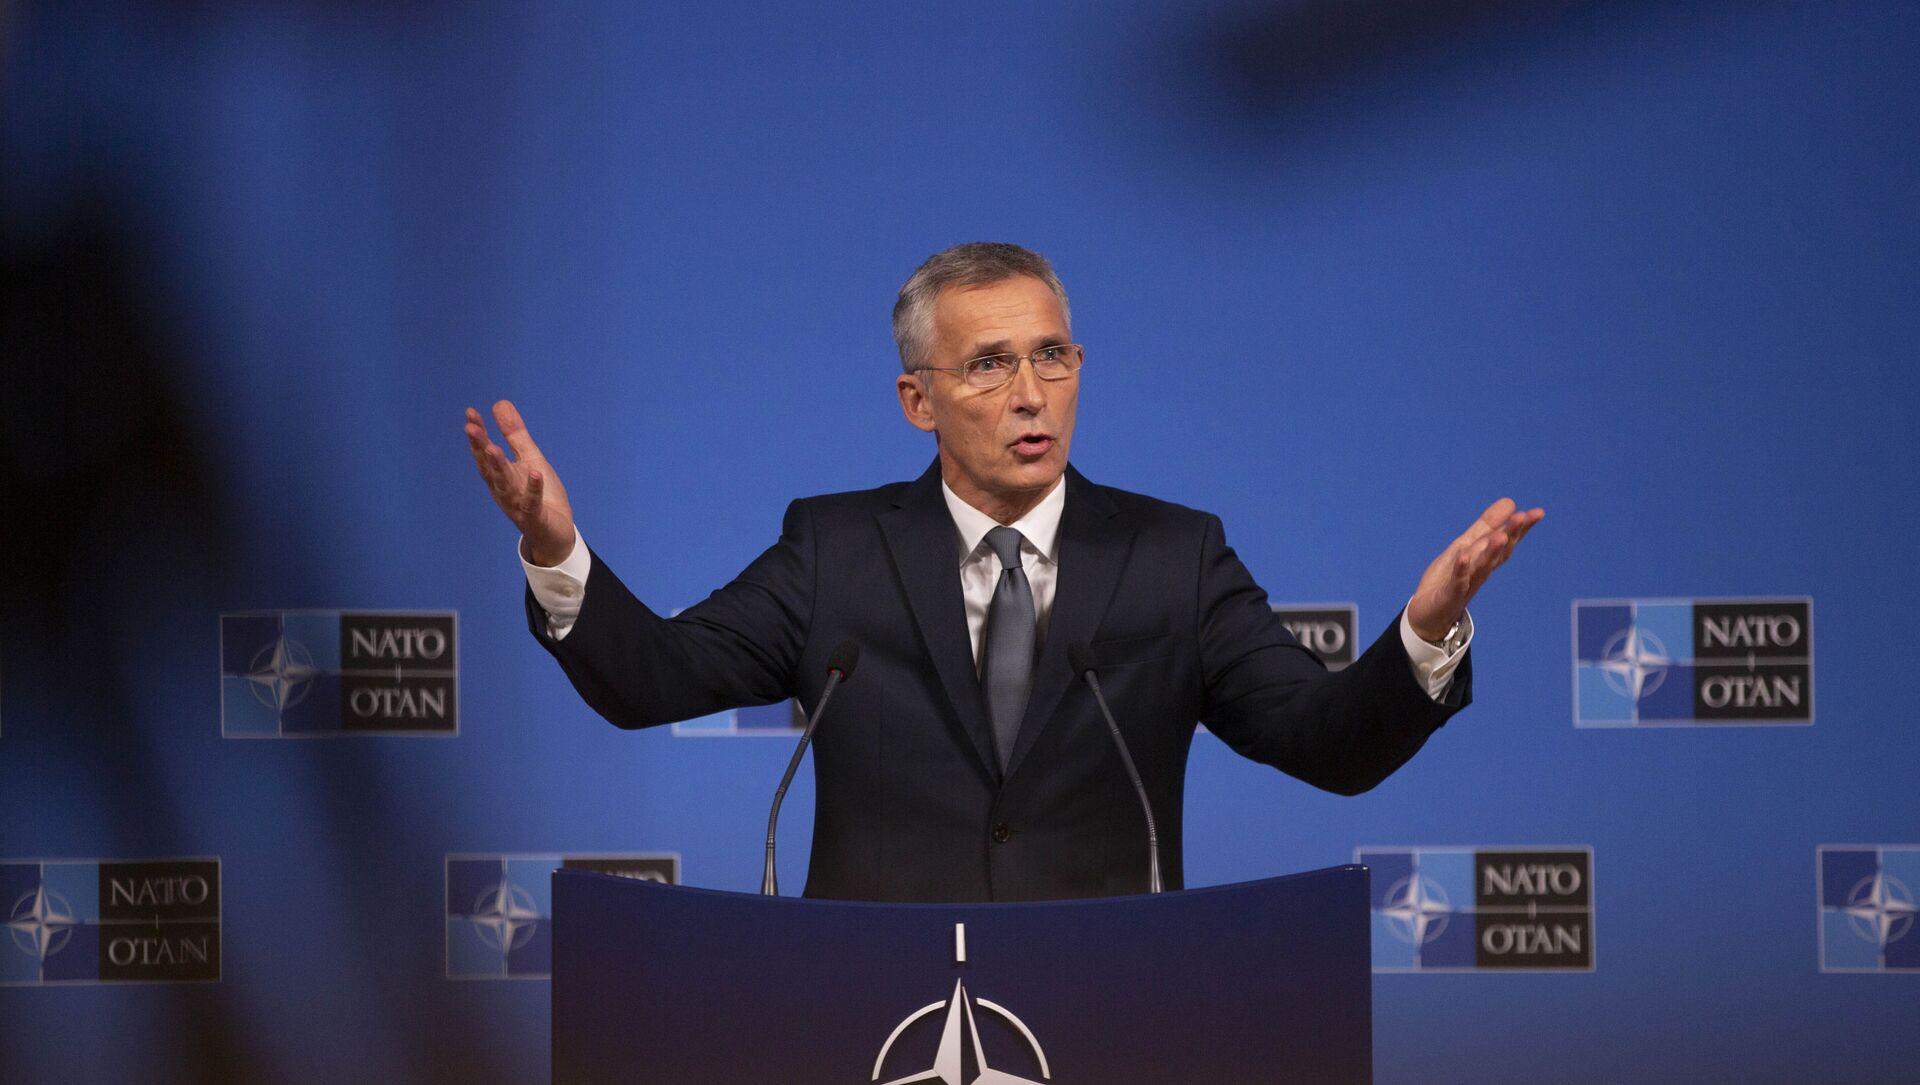 Generalni sekretar NATO-a Jens Stoltenberg - Sputnik Srbija, 1920, 14.06.2021